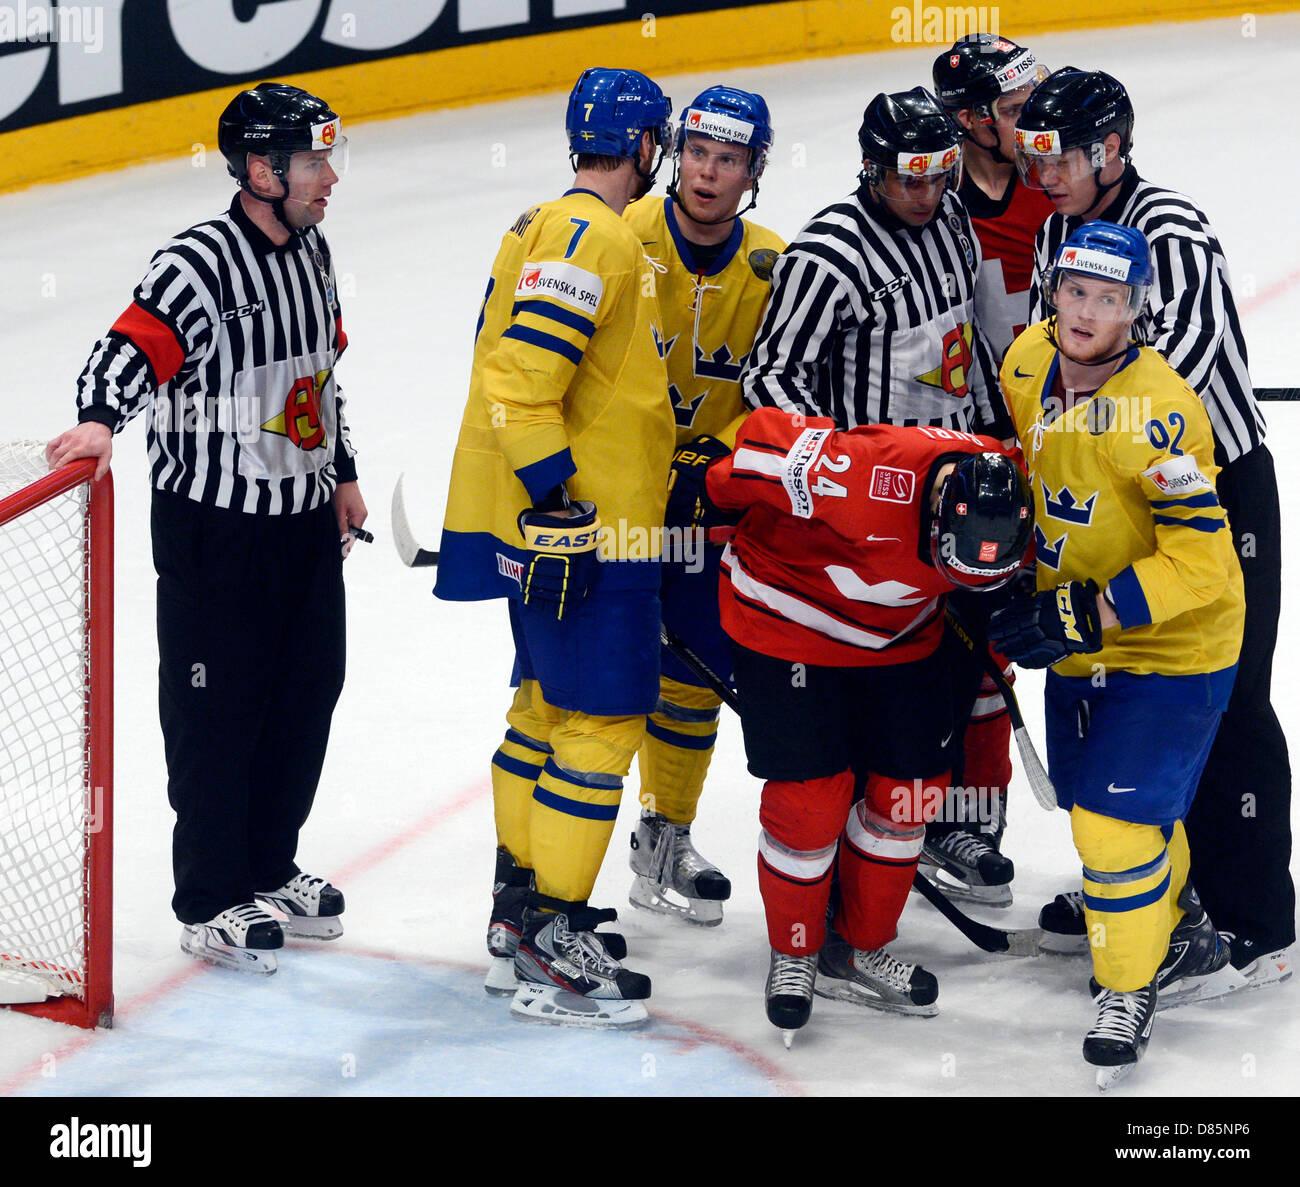 Stockholm, Sweden. 19th May 2013. IIHF World Championships, Ice Hockey, Czech Republic, final match Sweden vs. Switzerland, Stock Photo